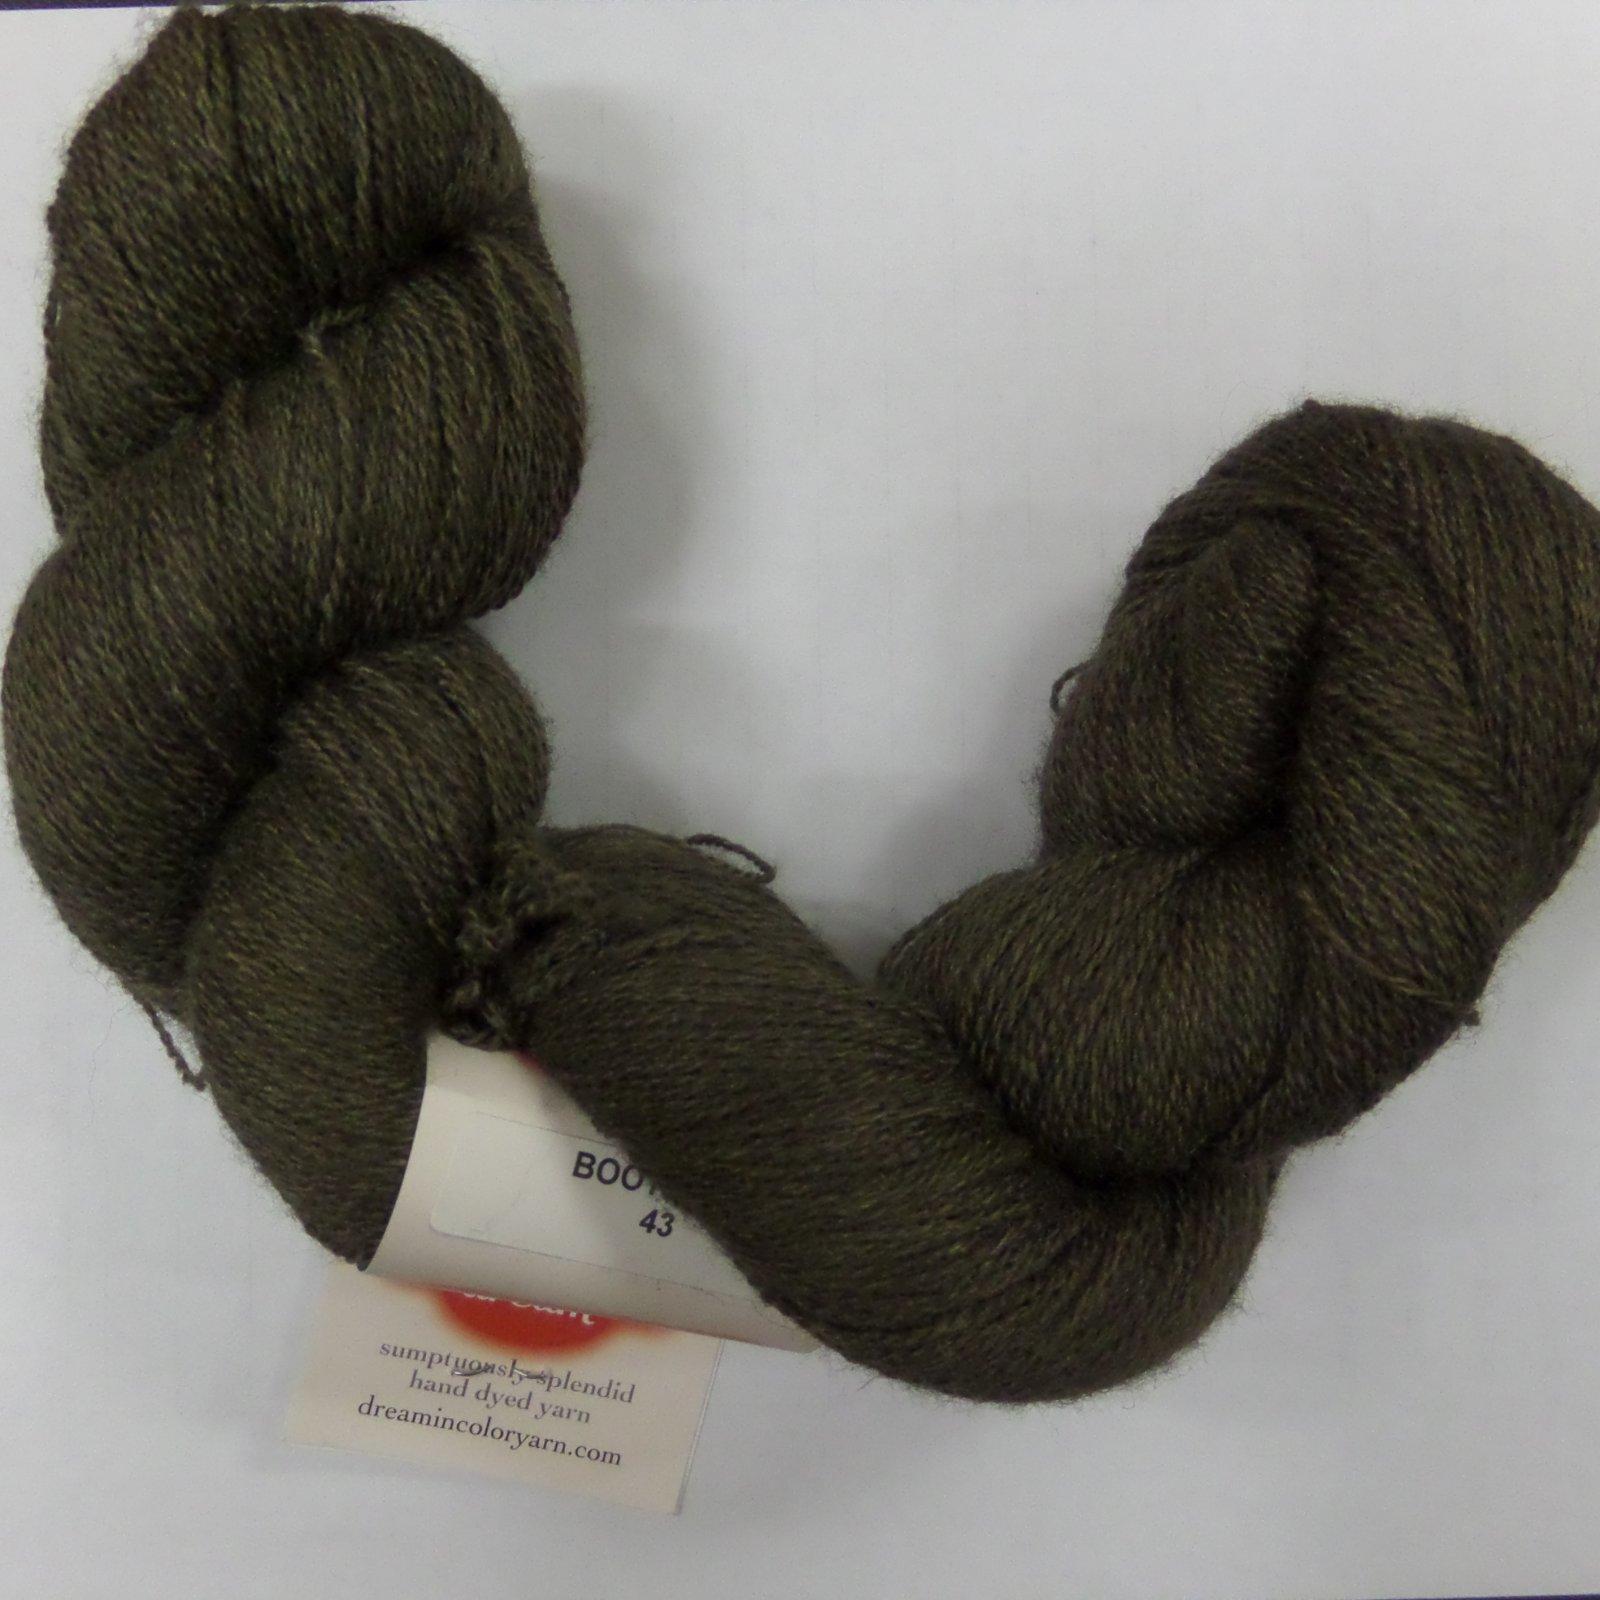 Wisp yarn from Dream in Color